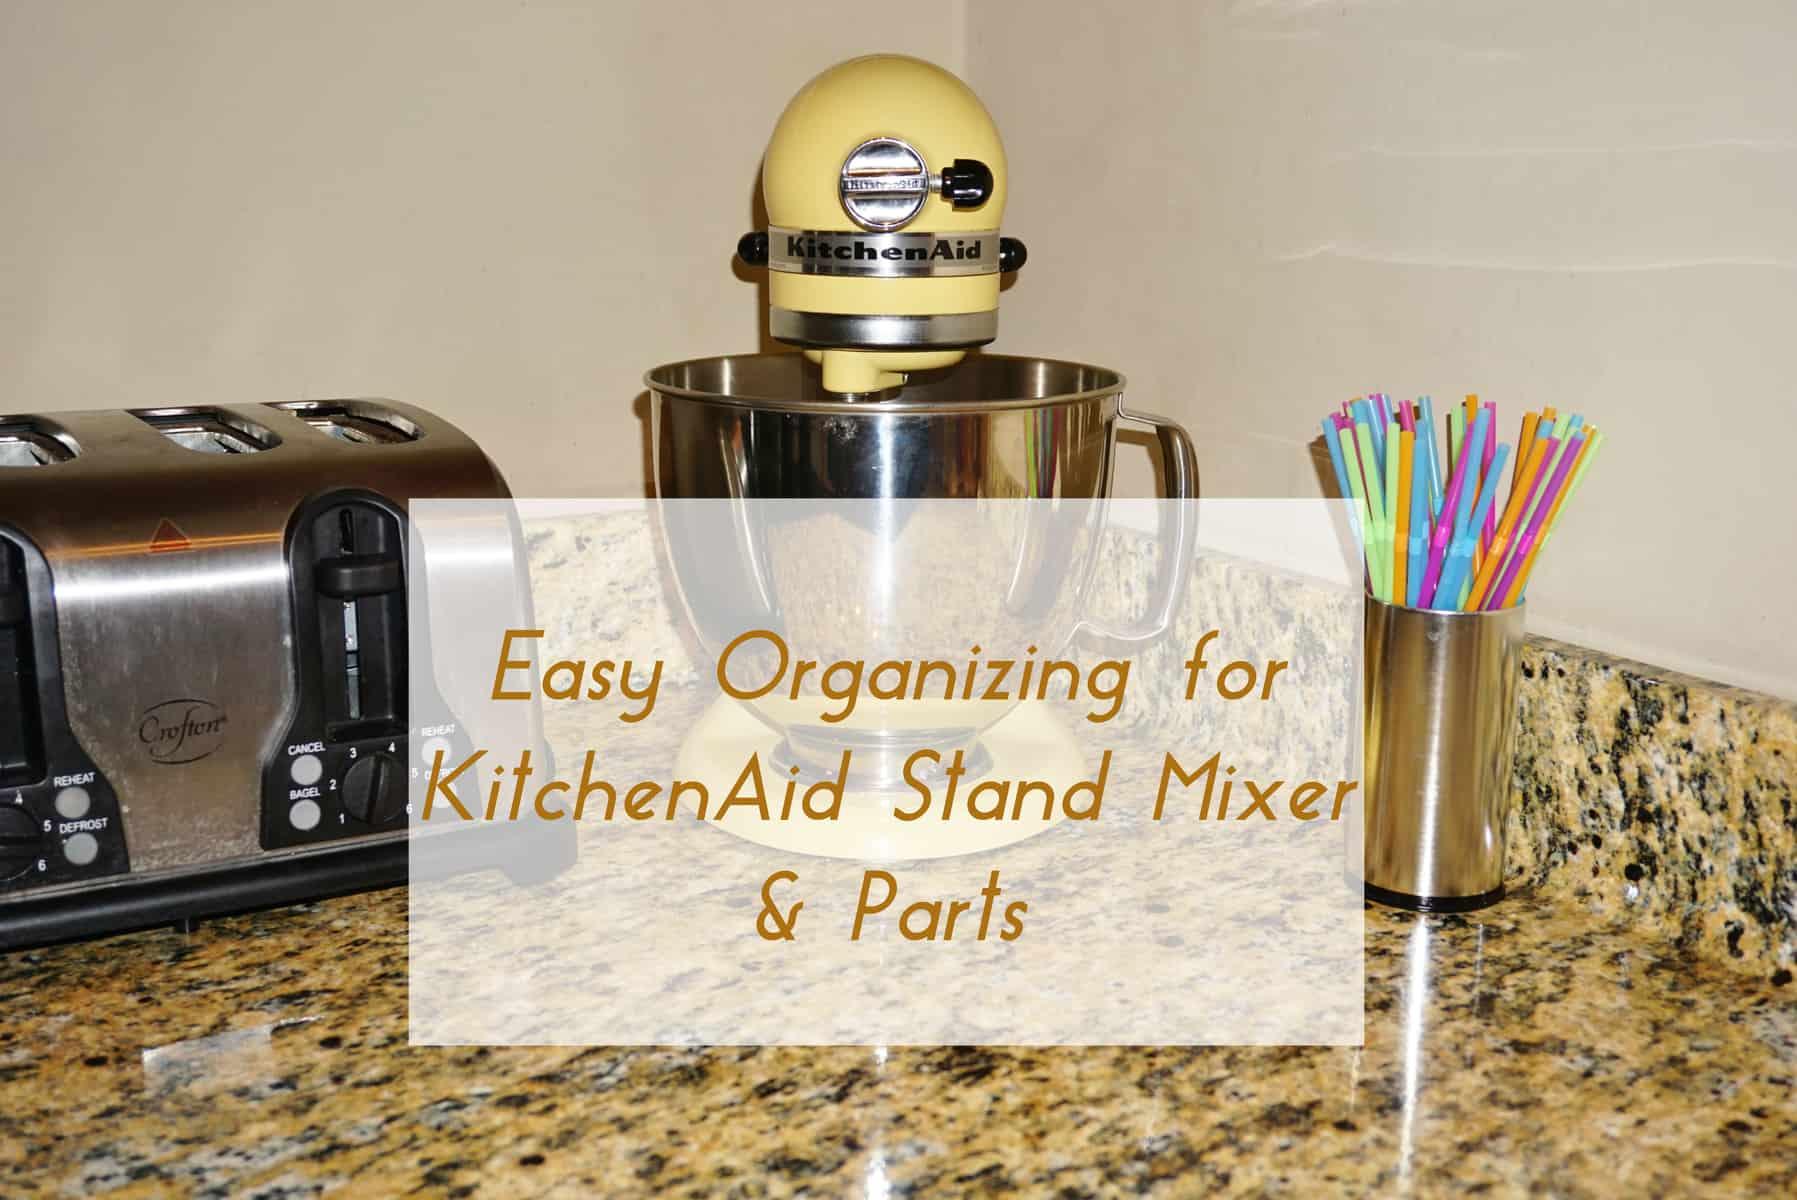 easy organizing for kitchenaid stand mixer u0026 parts heartworkorg com